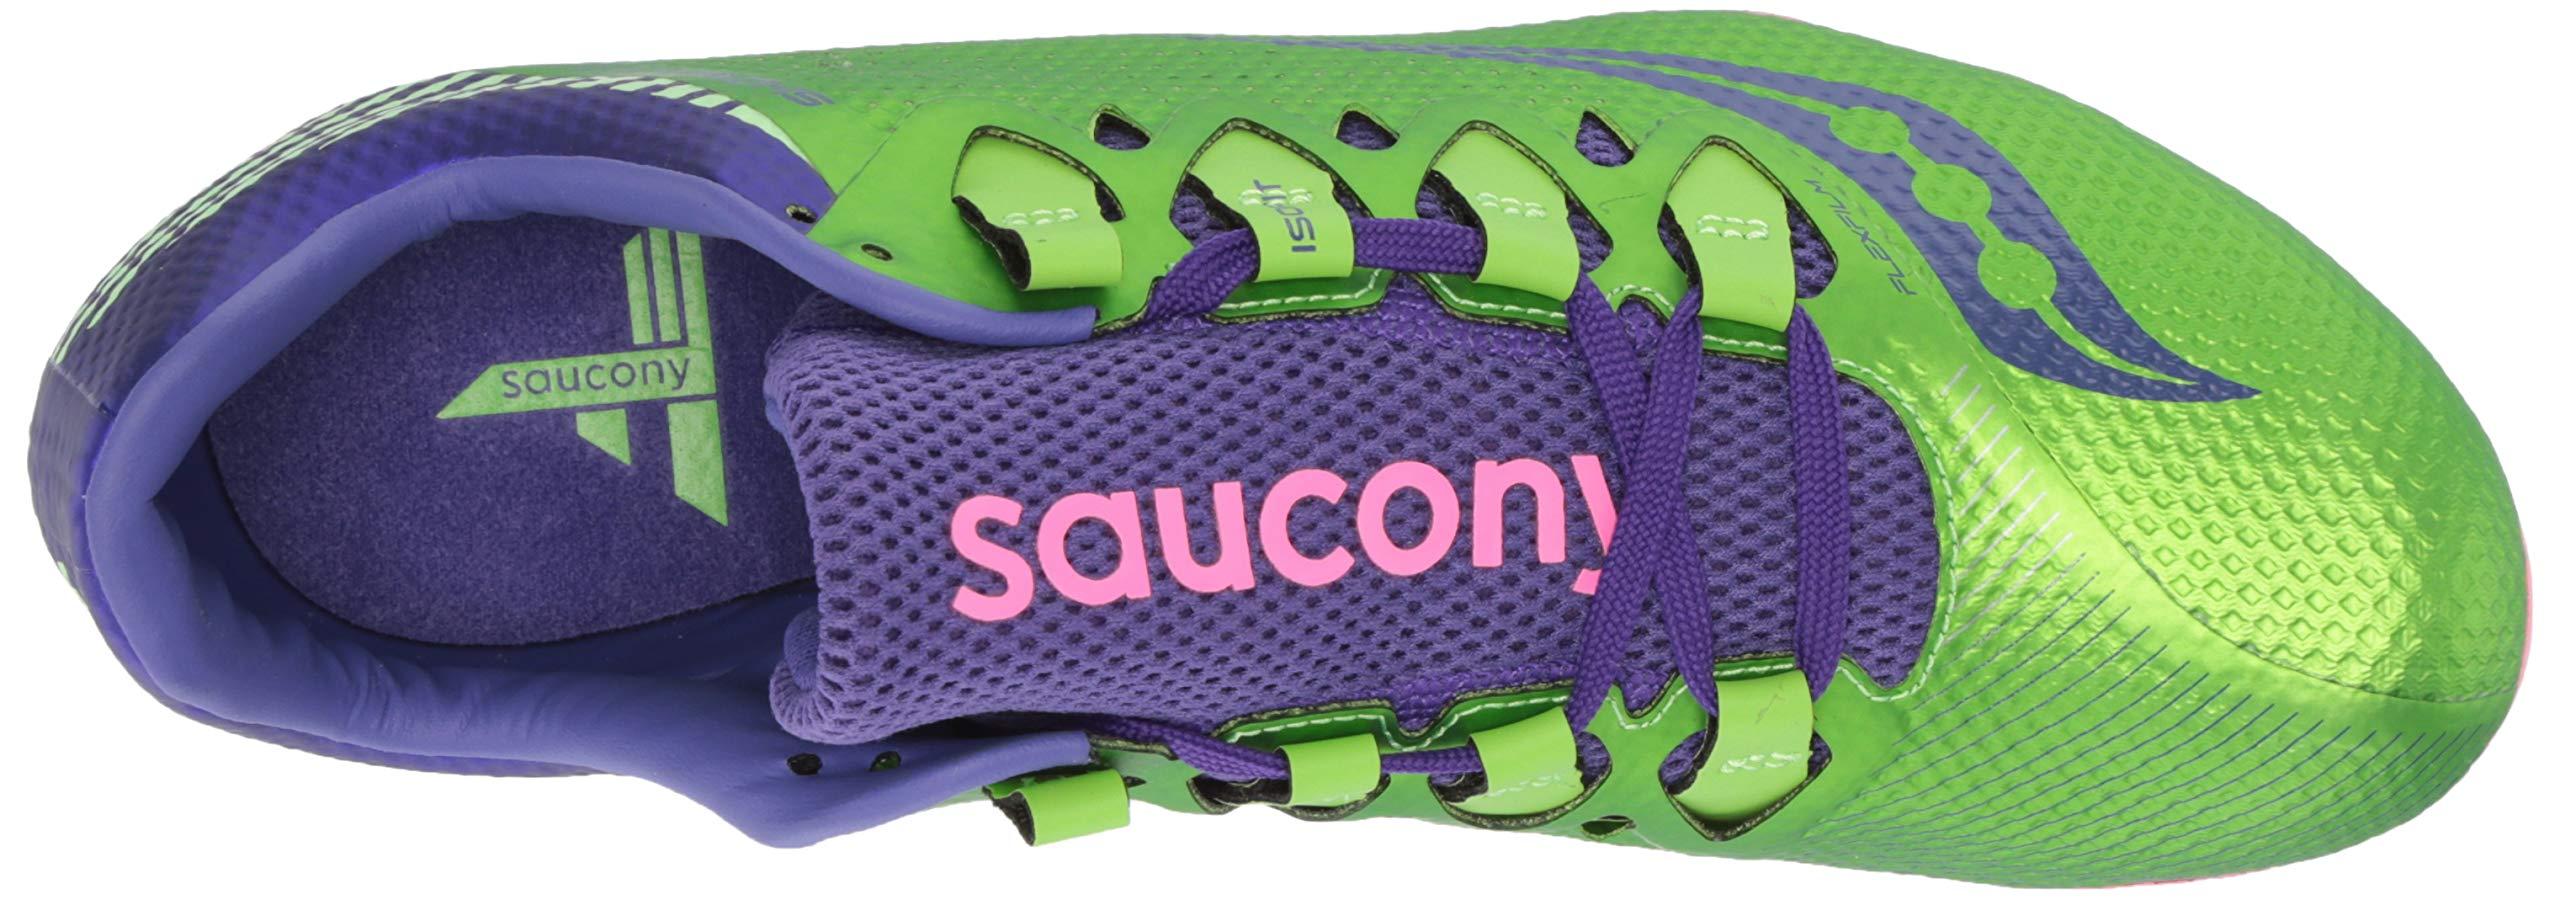 Saucony Showdown 4 Women 5.5 Slime | Purple by Saucony (Image #8)